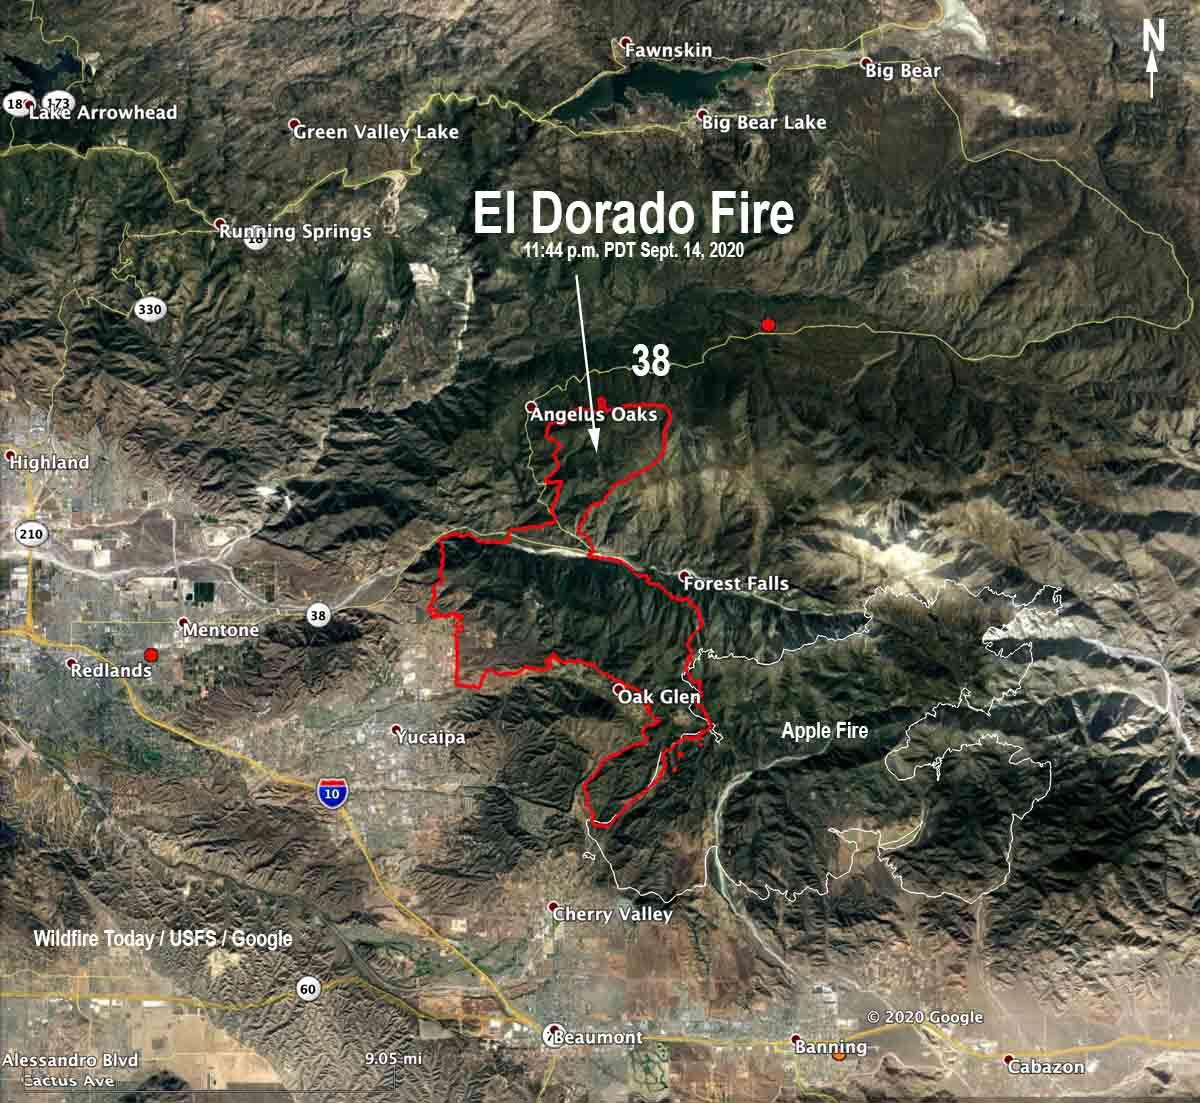 map of the El Dorado Fire